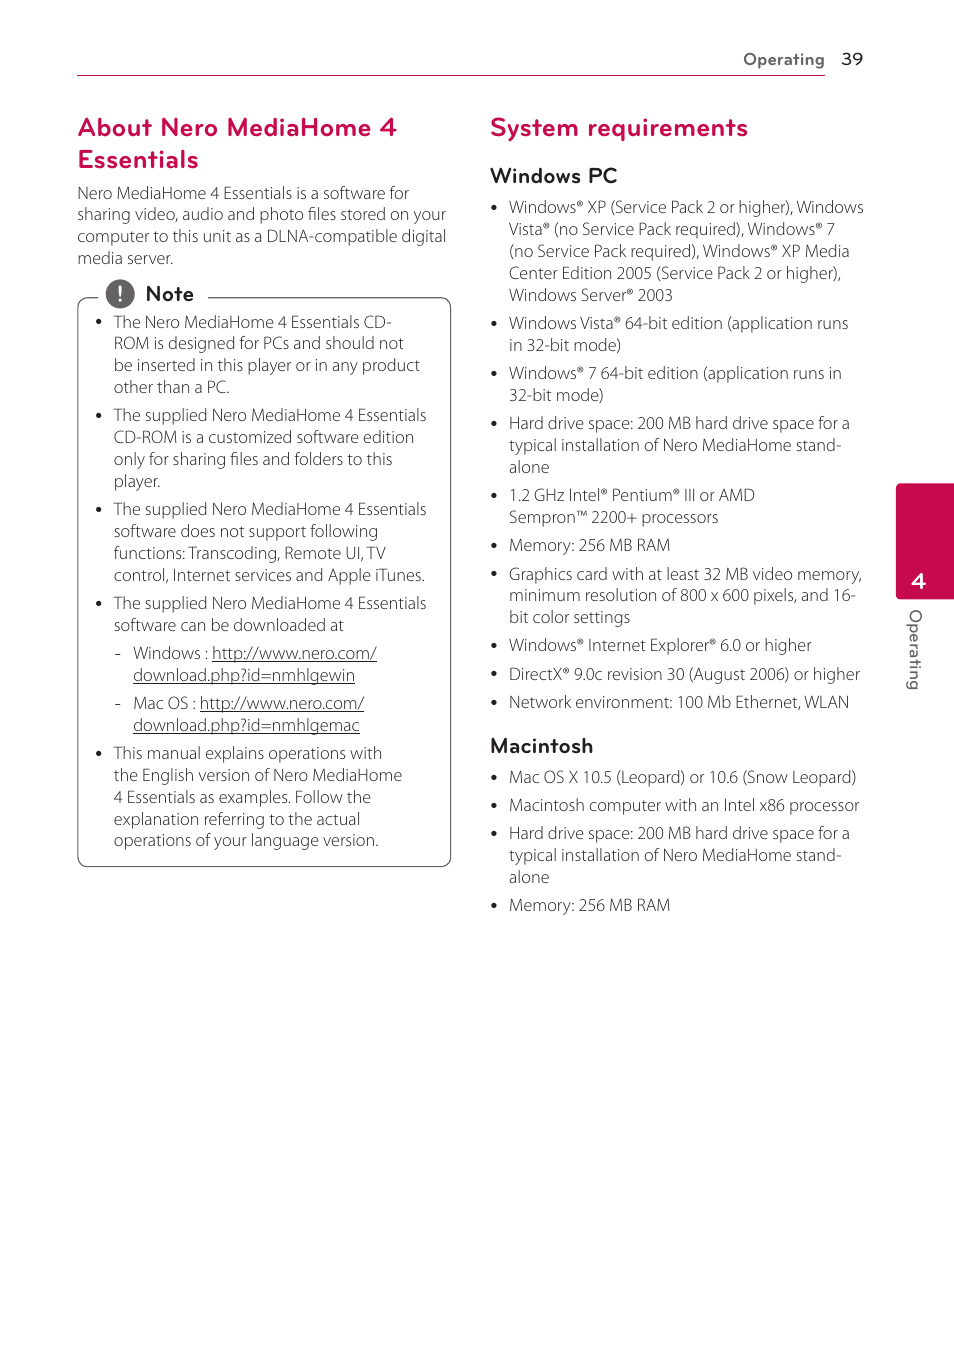 about nero mediahome 4 essentials system requirements lg bh6730s rh manualsdir com Nero 6 Windows 7 Nero 6 Windows 7